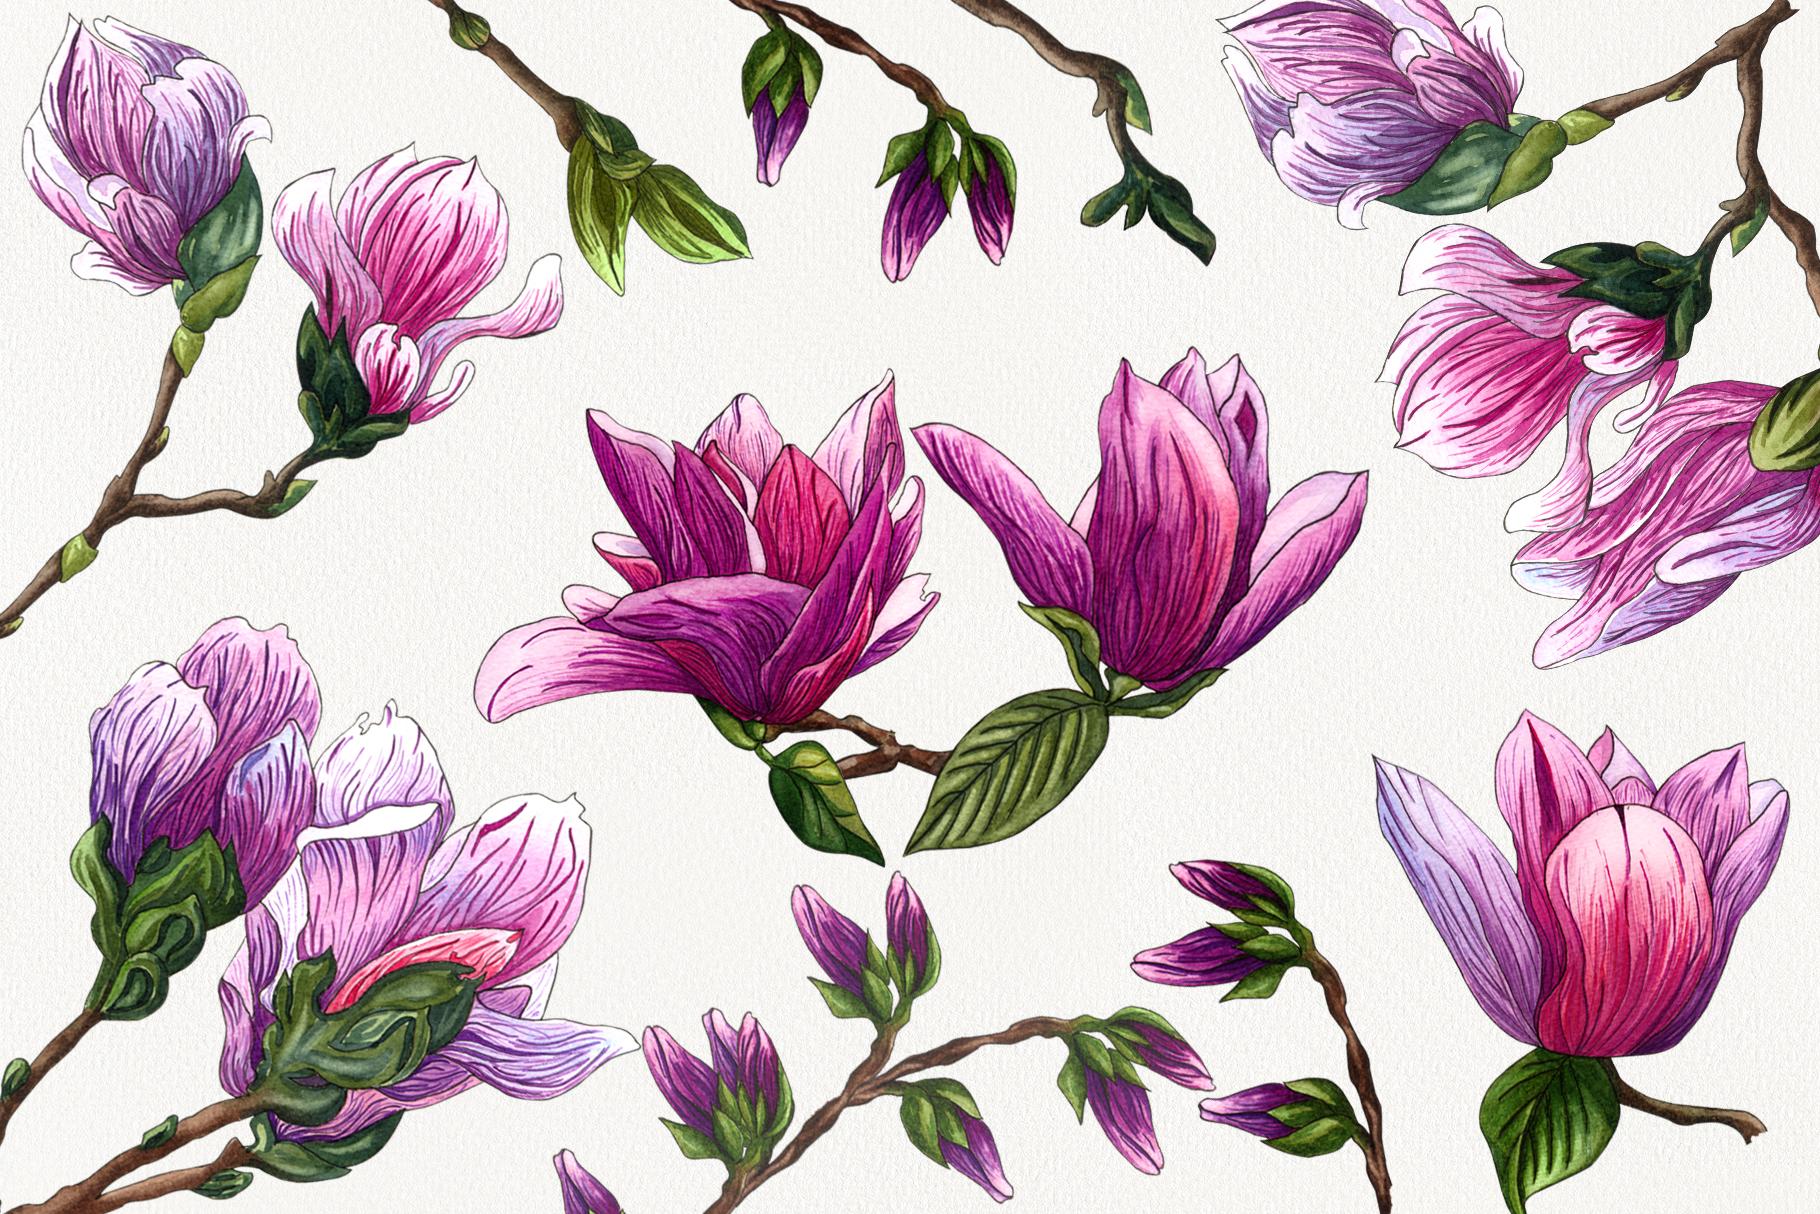 Magnolia Bloom example image 3